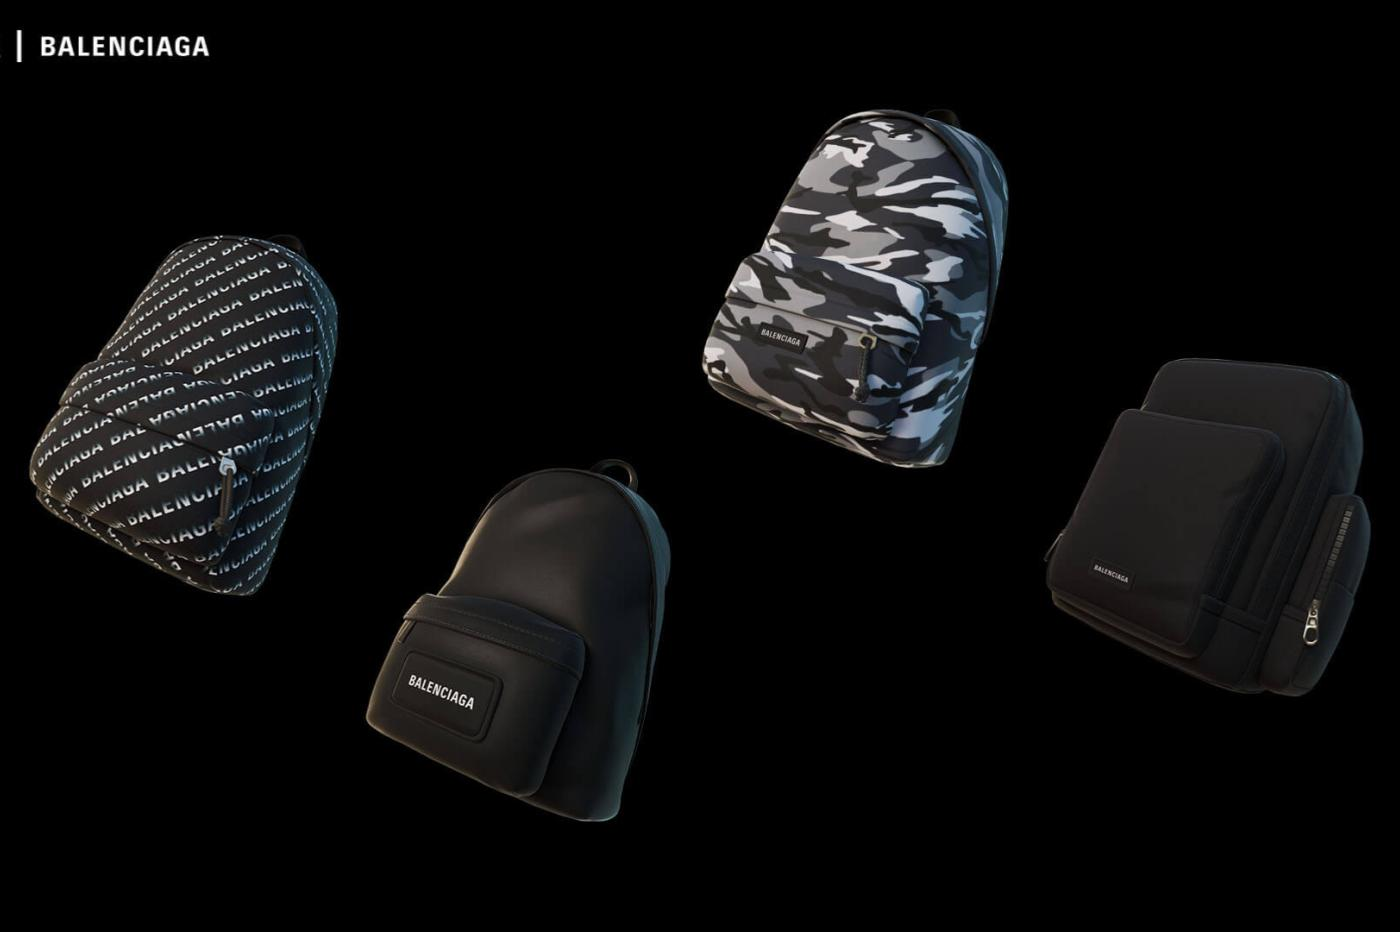 Fortnite Balenciaga Backpack Accessories